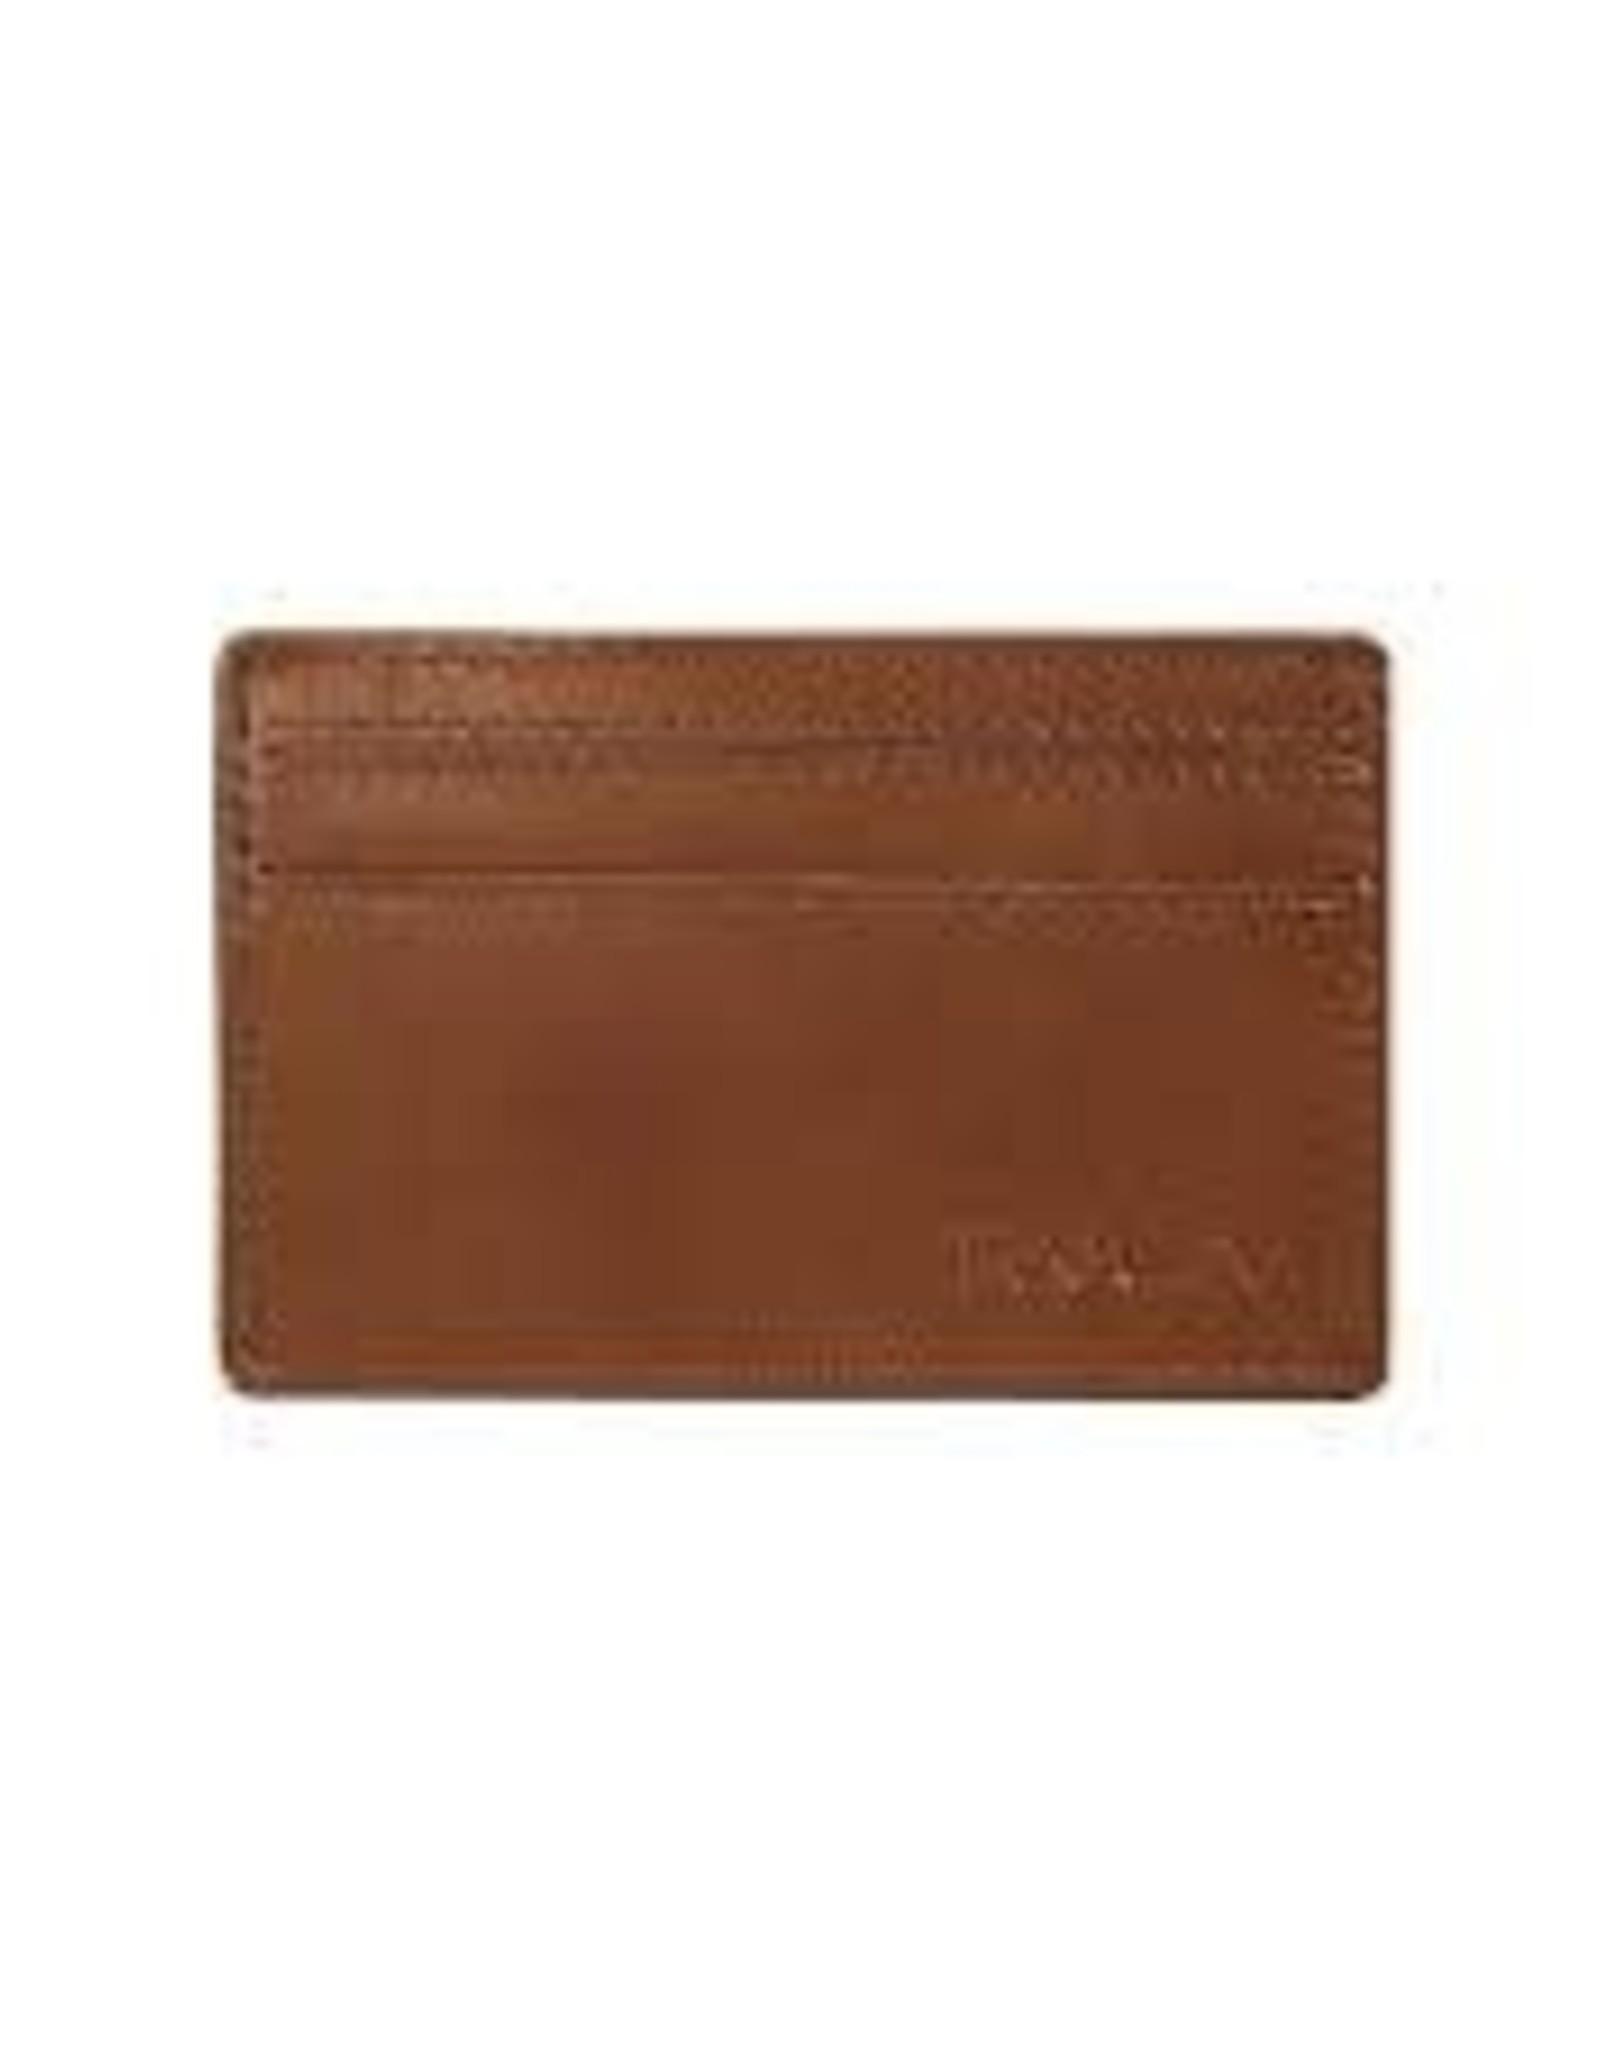 RVCA Clean Card Wallet TAN